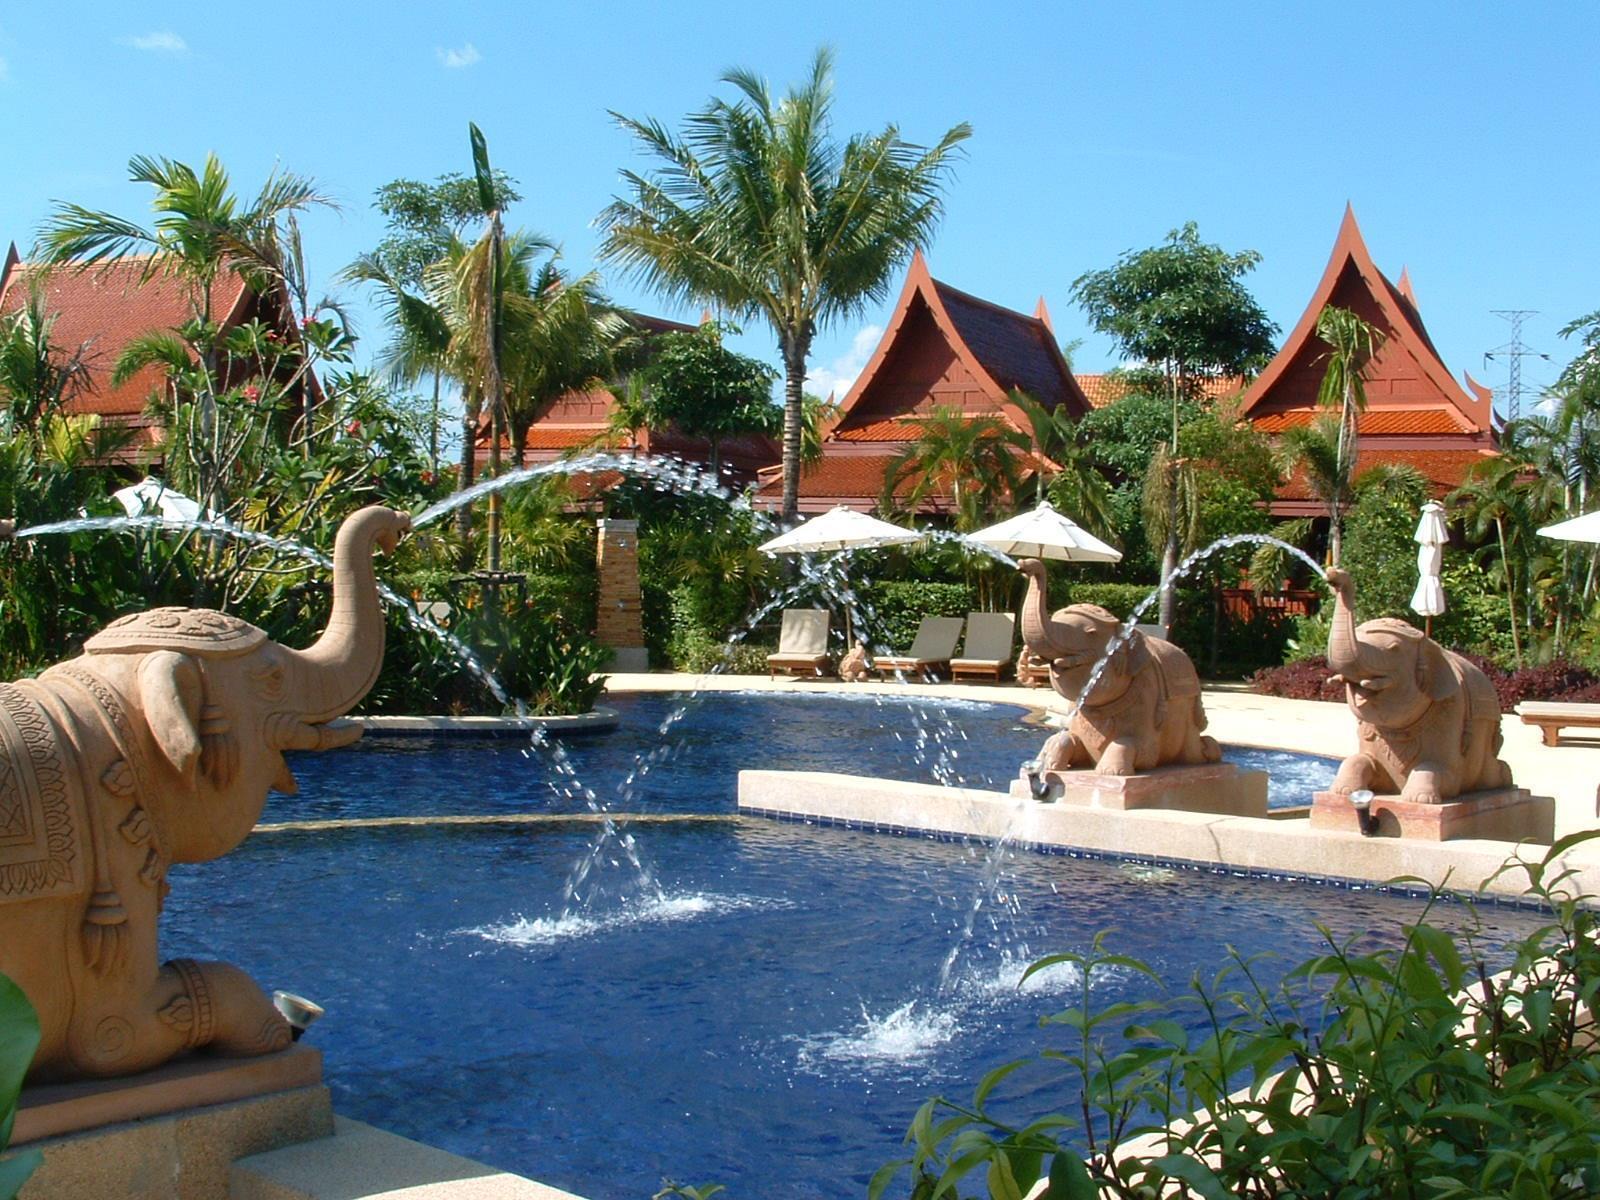 At Panta Hotel Phuket โรงแรมแอท พันตา ภูเก็ต